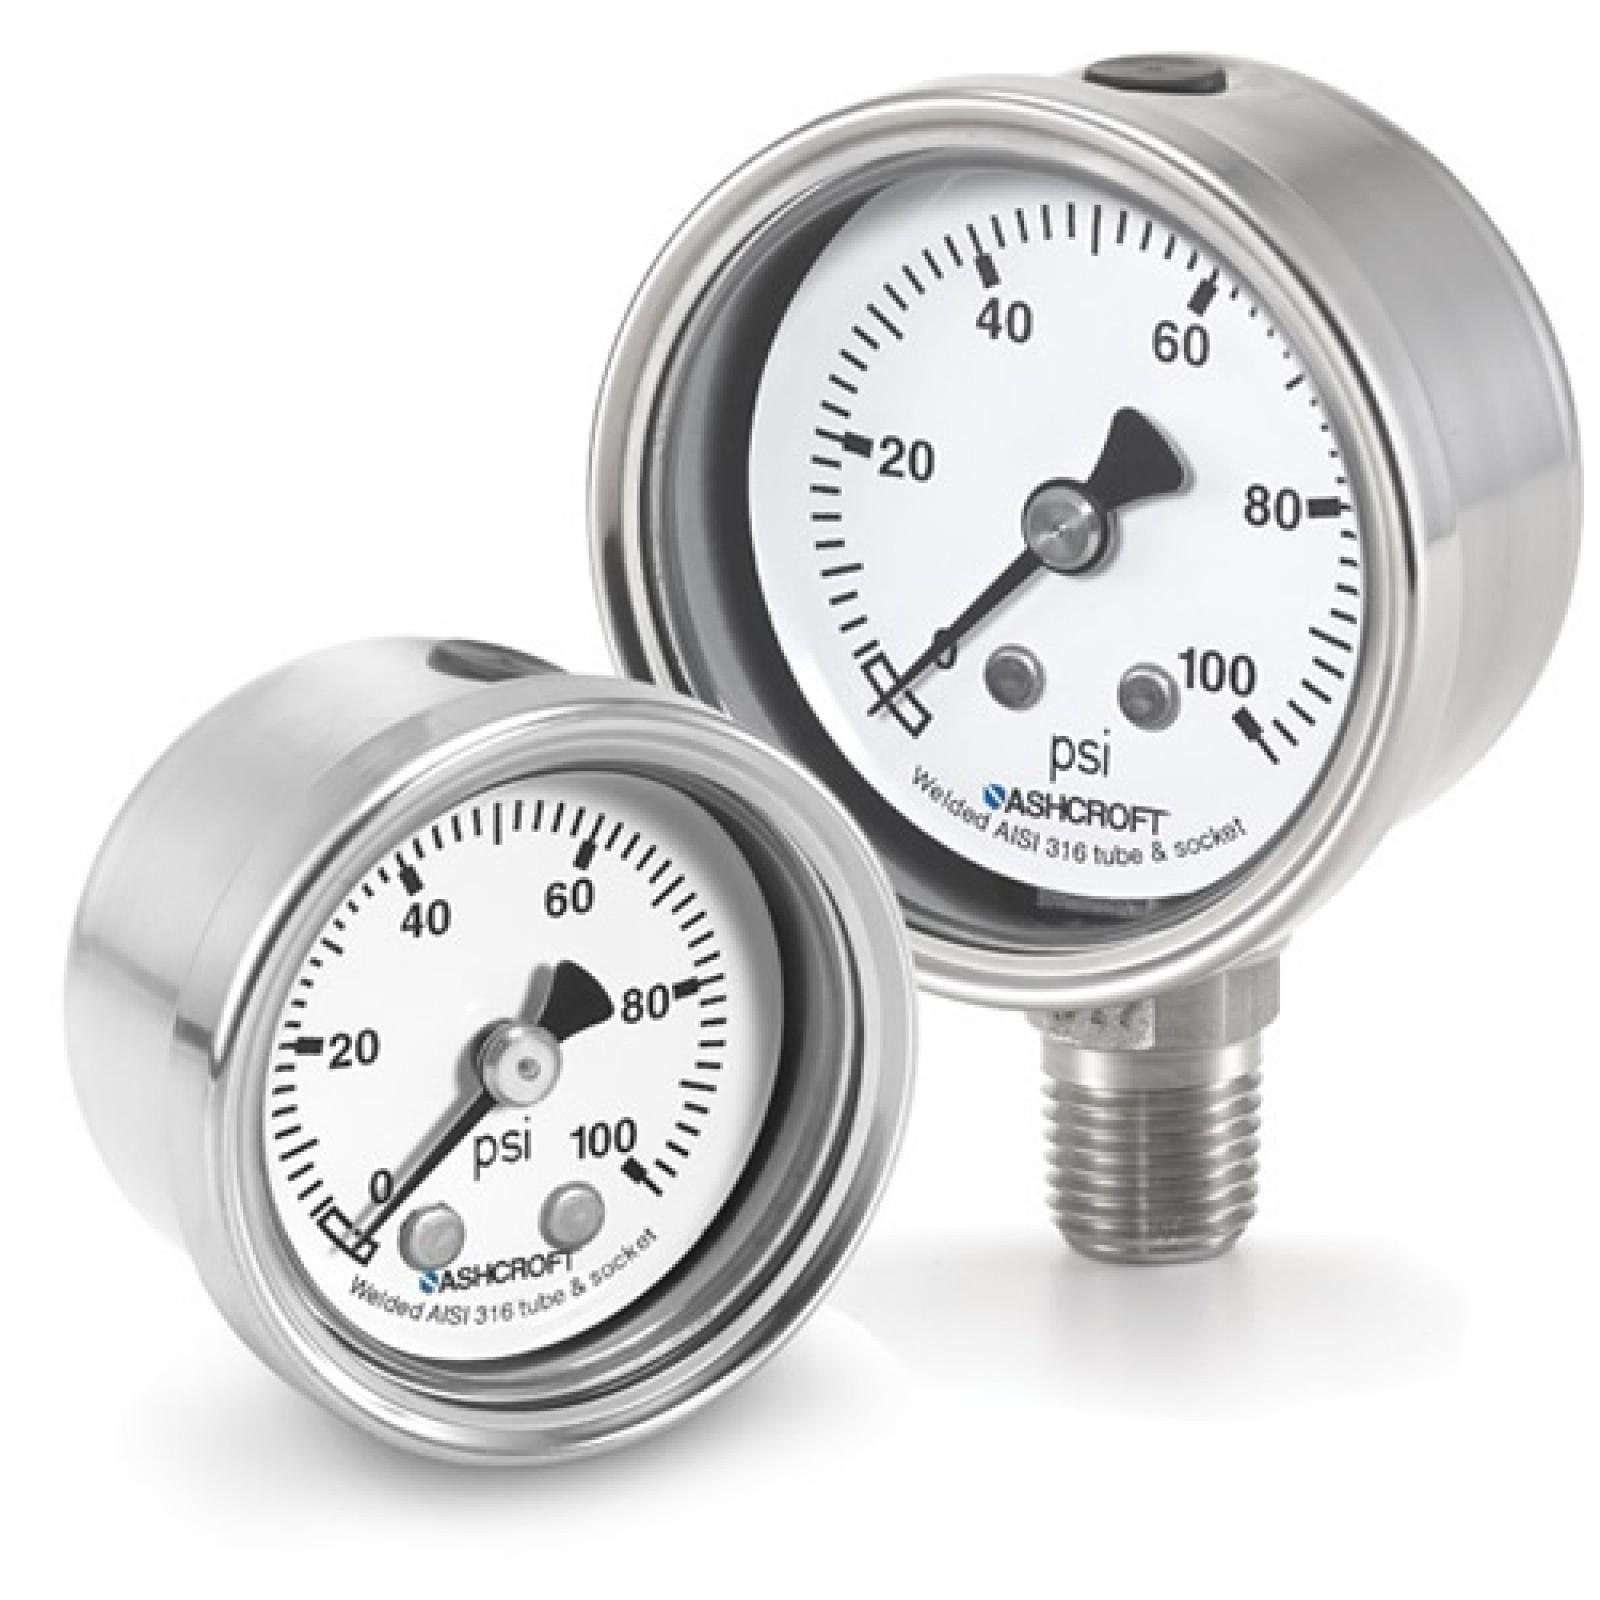 "63 1008S 02L XLL 1500#/KP - Pressure Gauge, 63mm stainless 1/4"" NPT Lower conn & Case, Plus Performance 0/1500 psi"